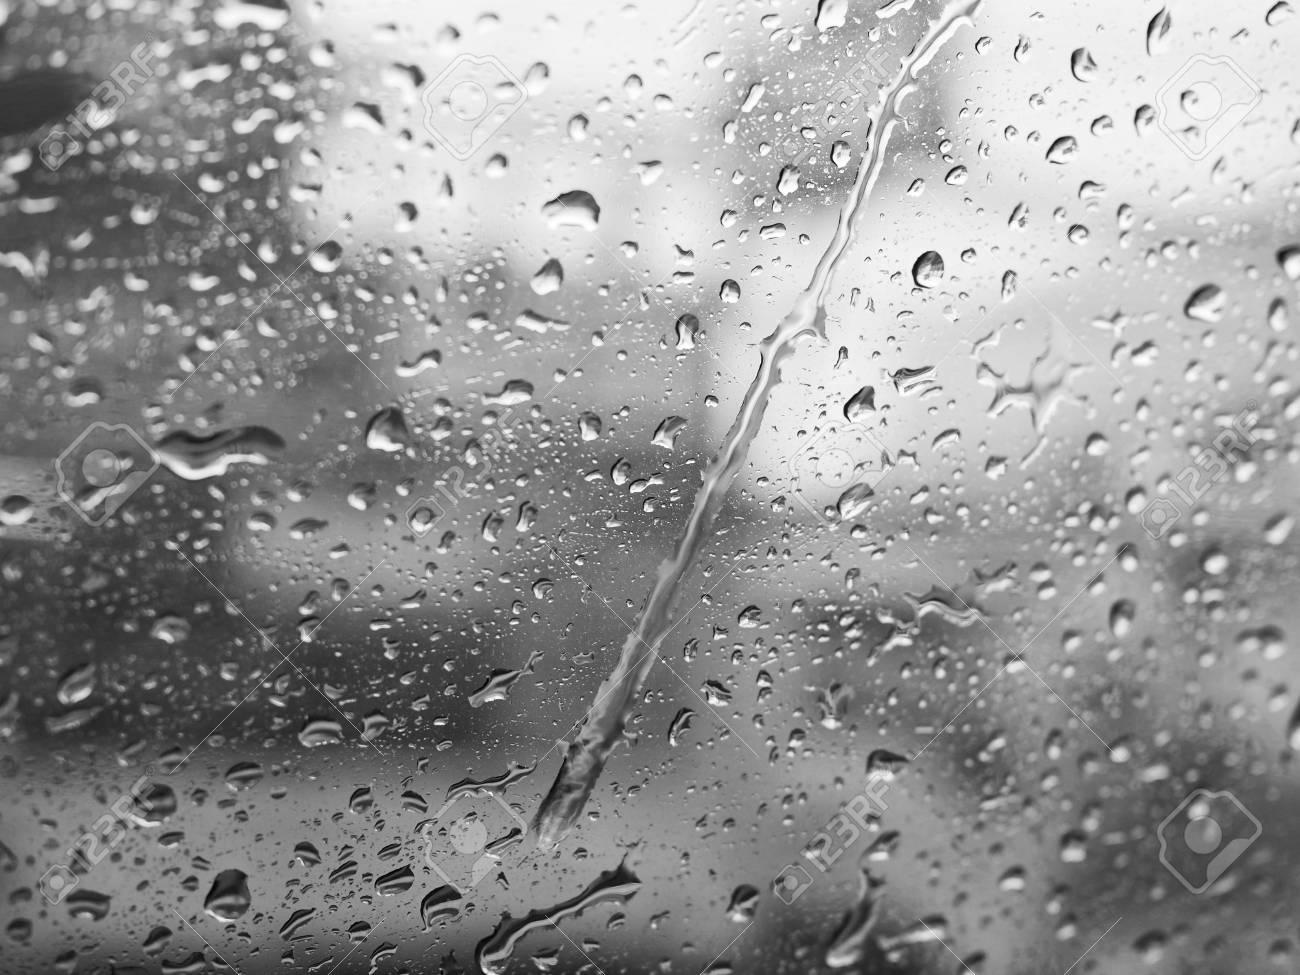 Rain on window black and white